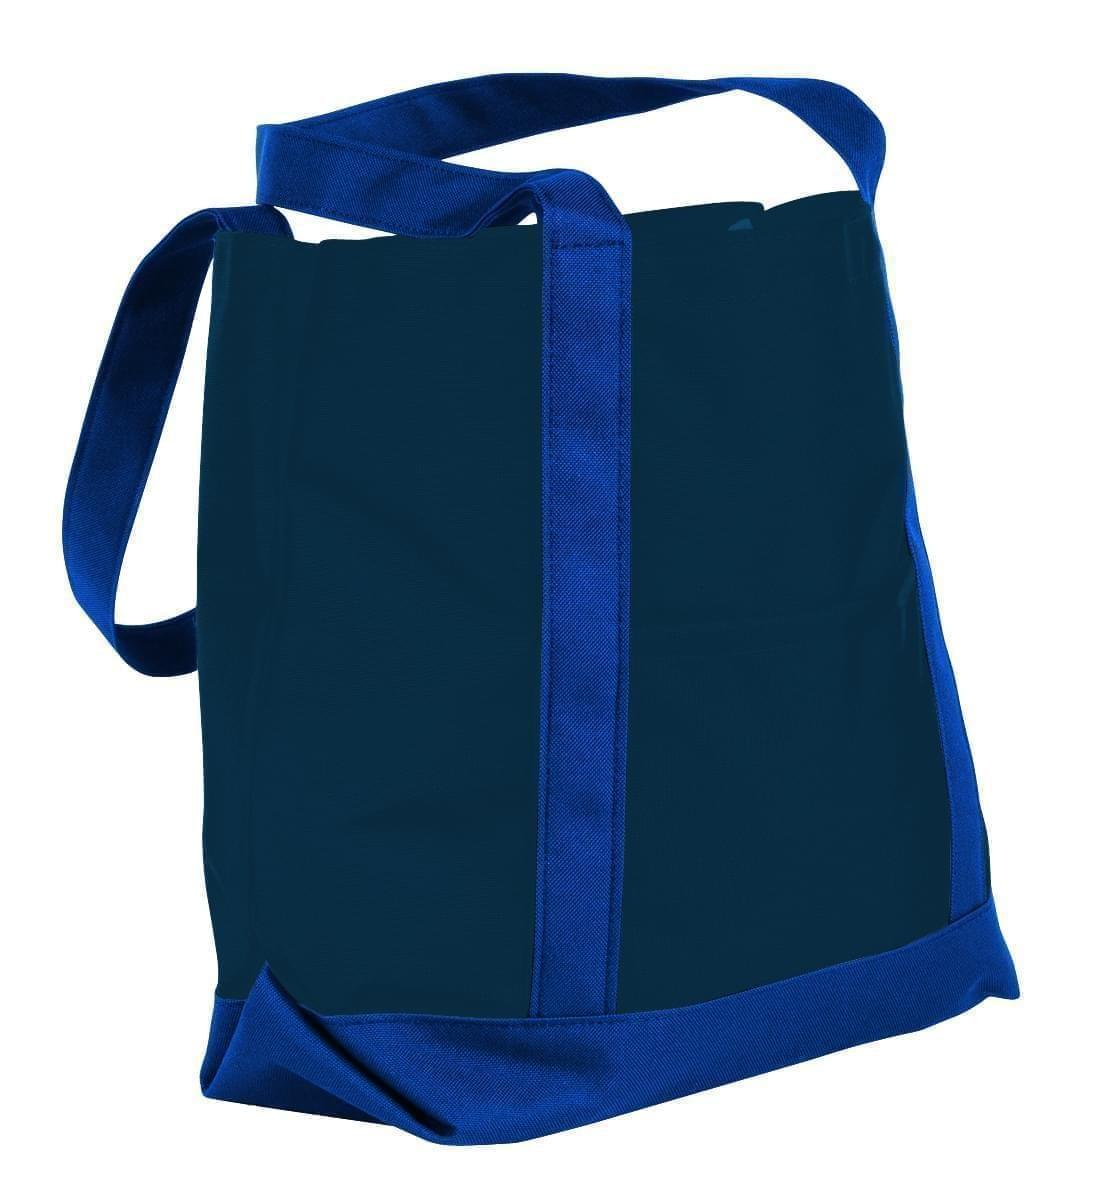 USA Made Nylon Poly Boat Tote Bags, Navy-Royal Blue, XAACL1UAWM